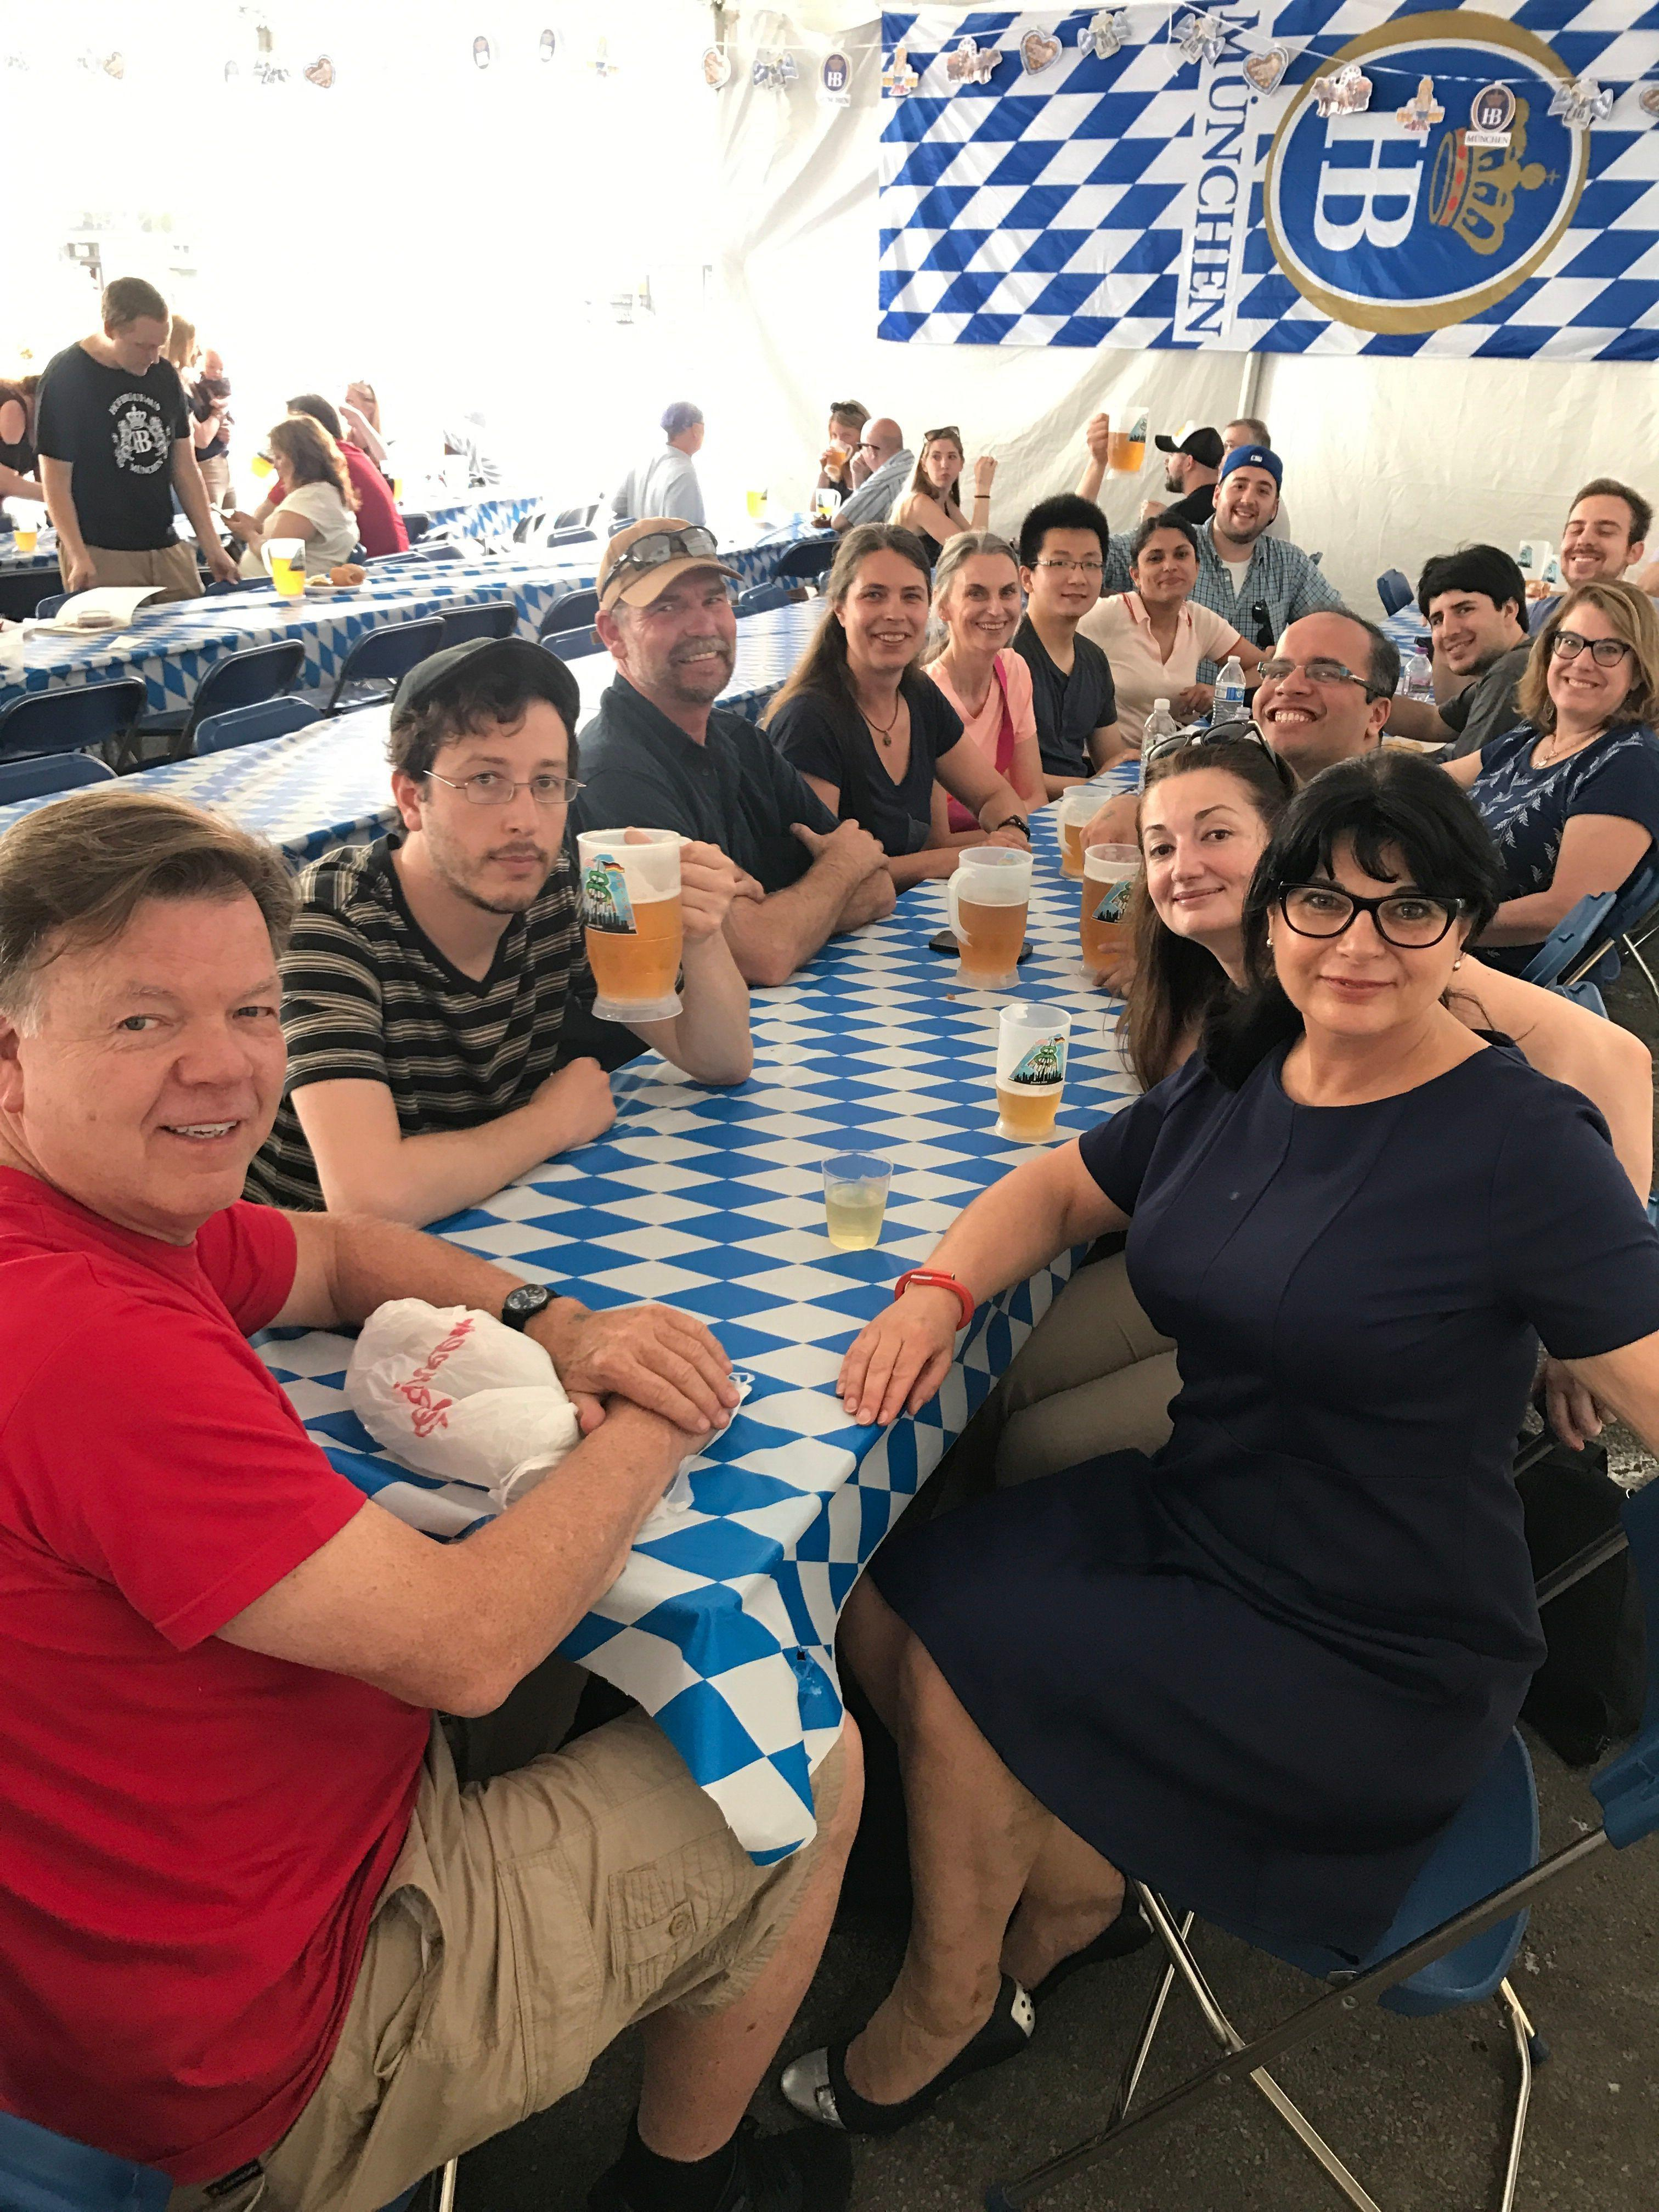 The Chicago German Language Meetup Group